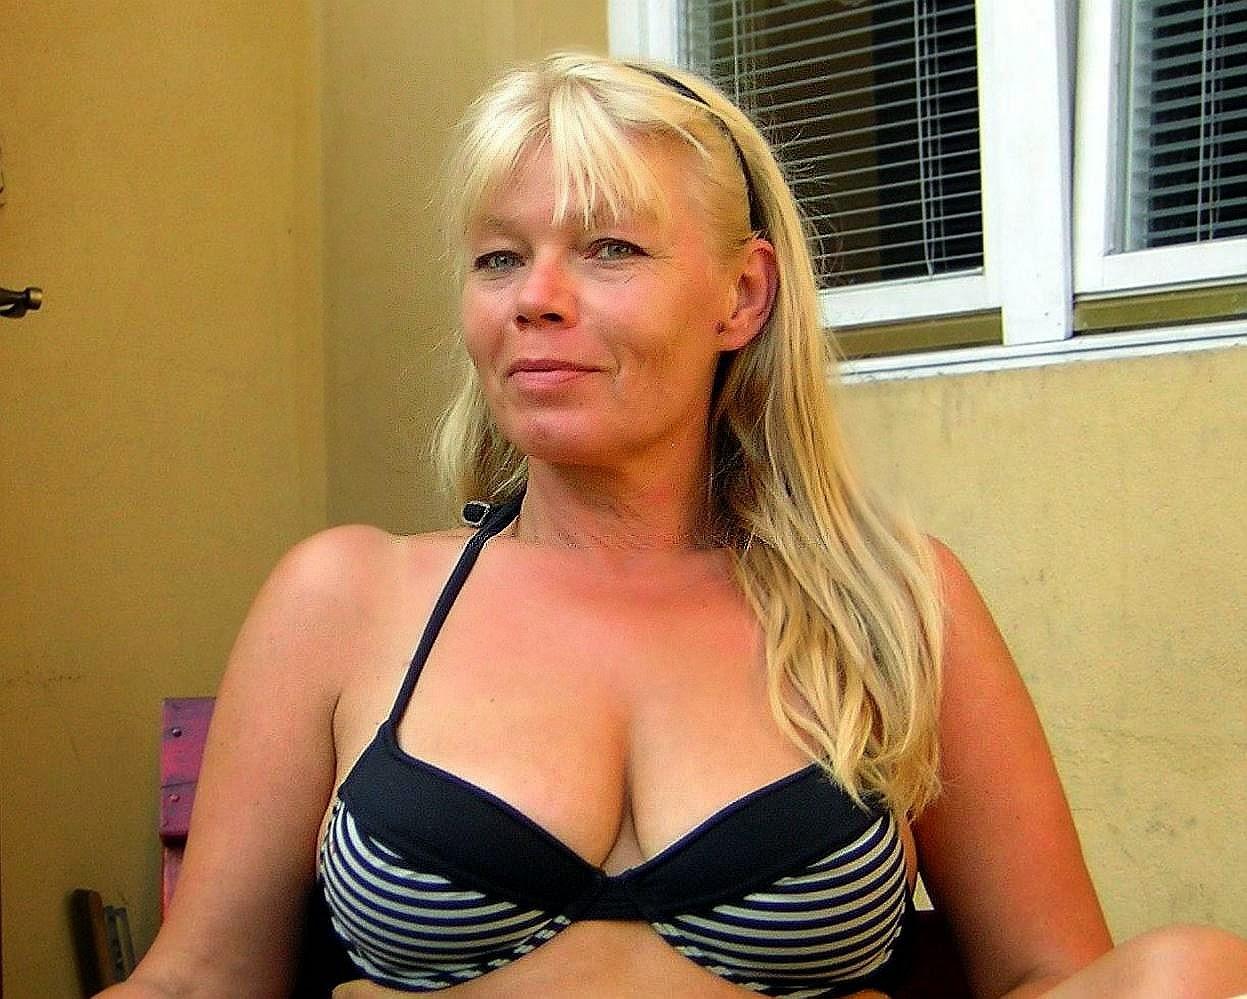 Spanish Blonde Divorced Photos Woman Seeking Man